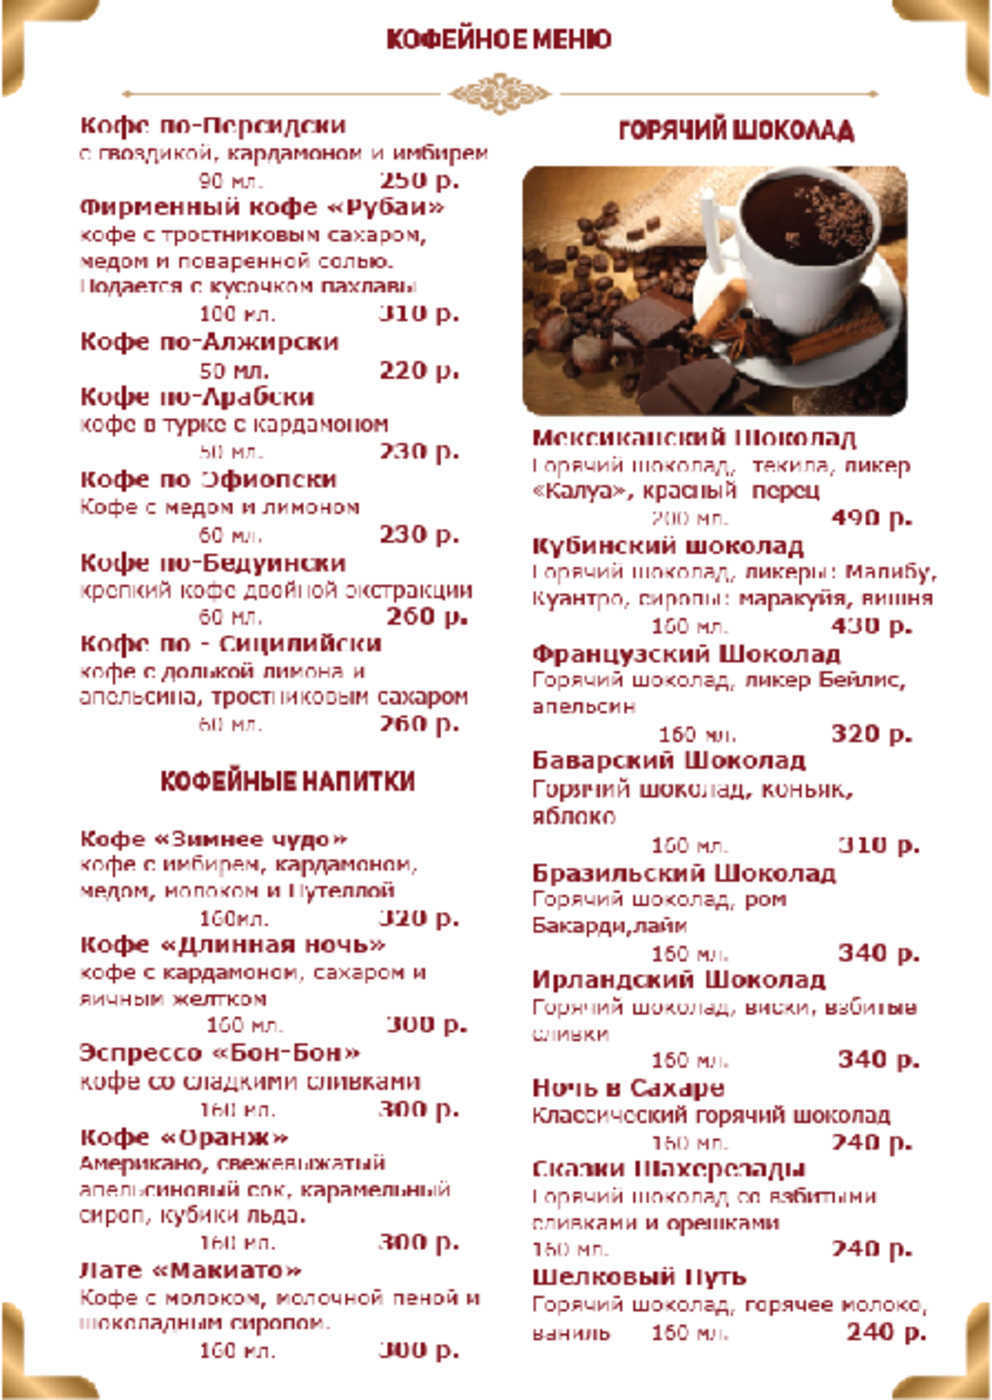 Меню кафе Рубаи на набережной реки Фонтанки фото 28